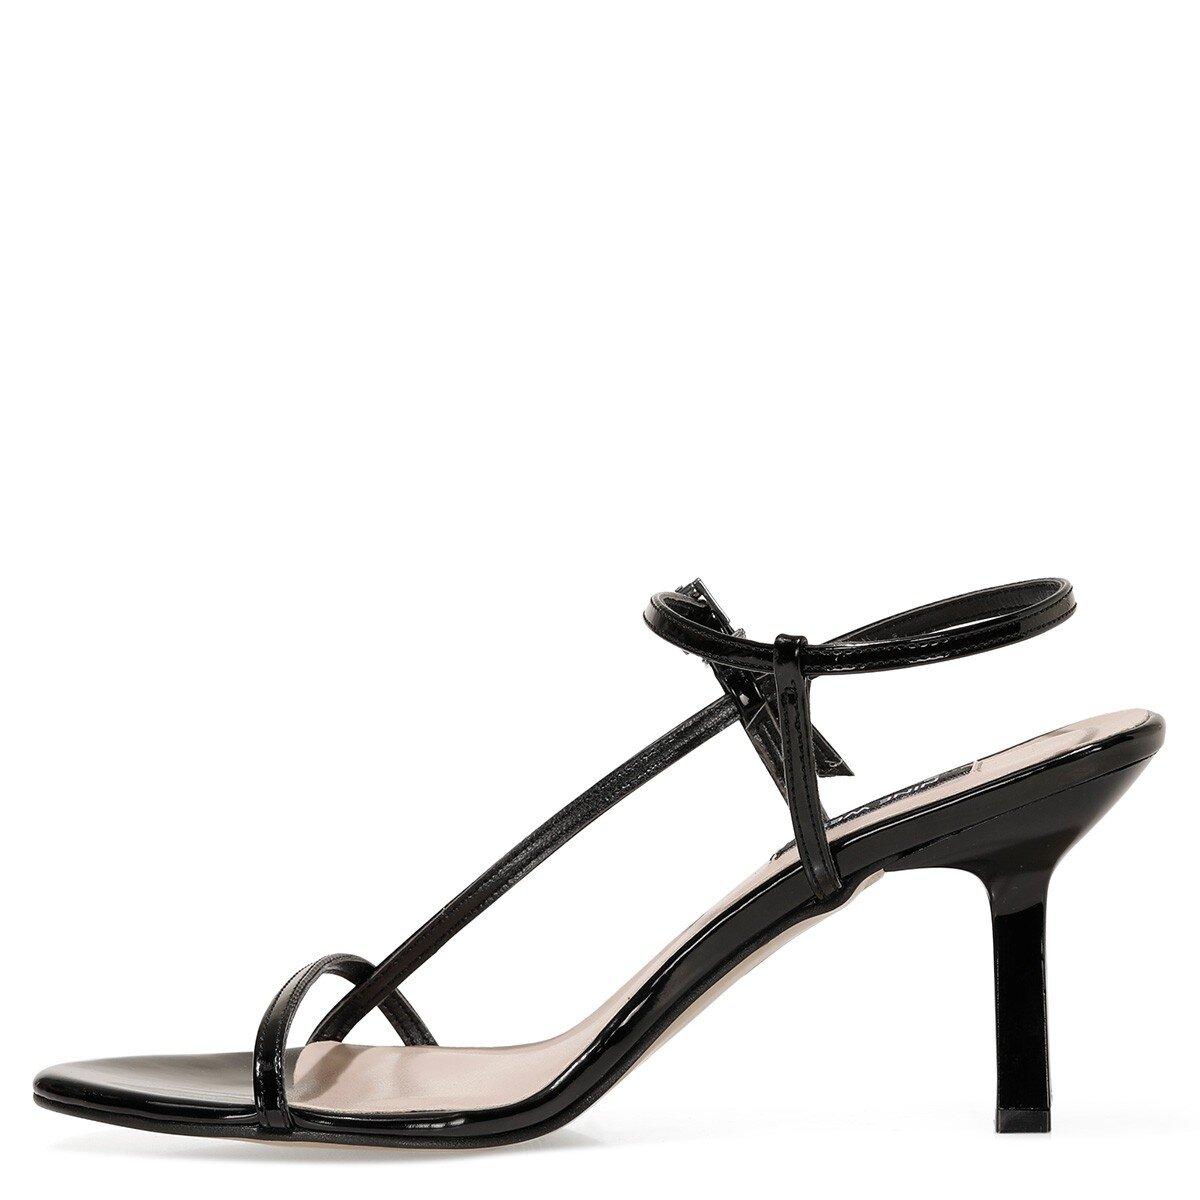 REBELL 1FX Siyah Kadın Topuklu Sandalet